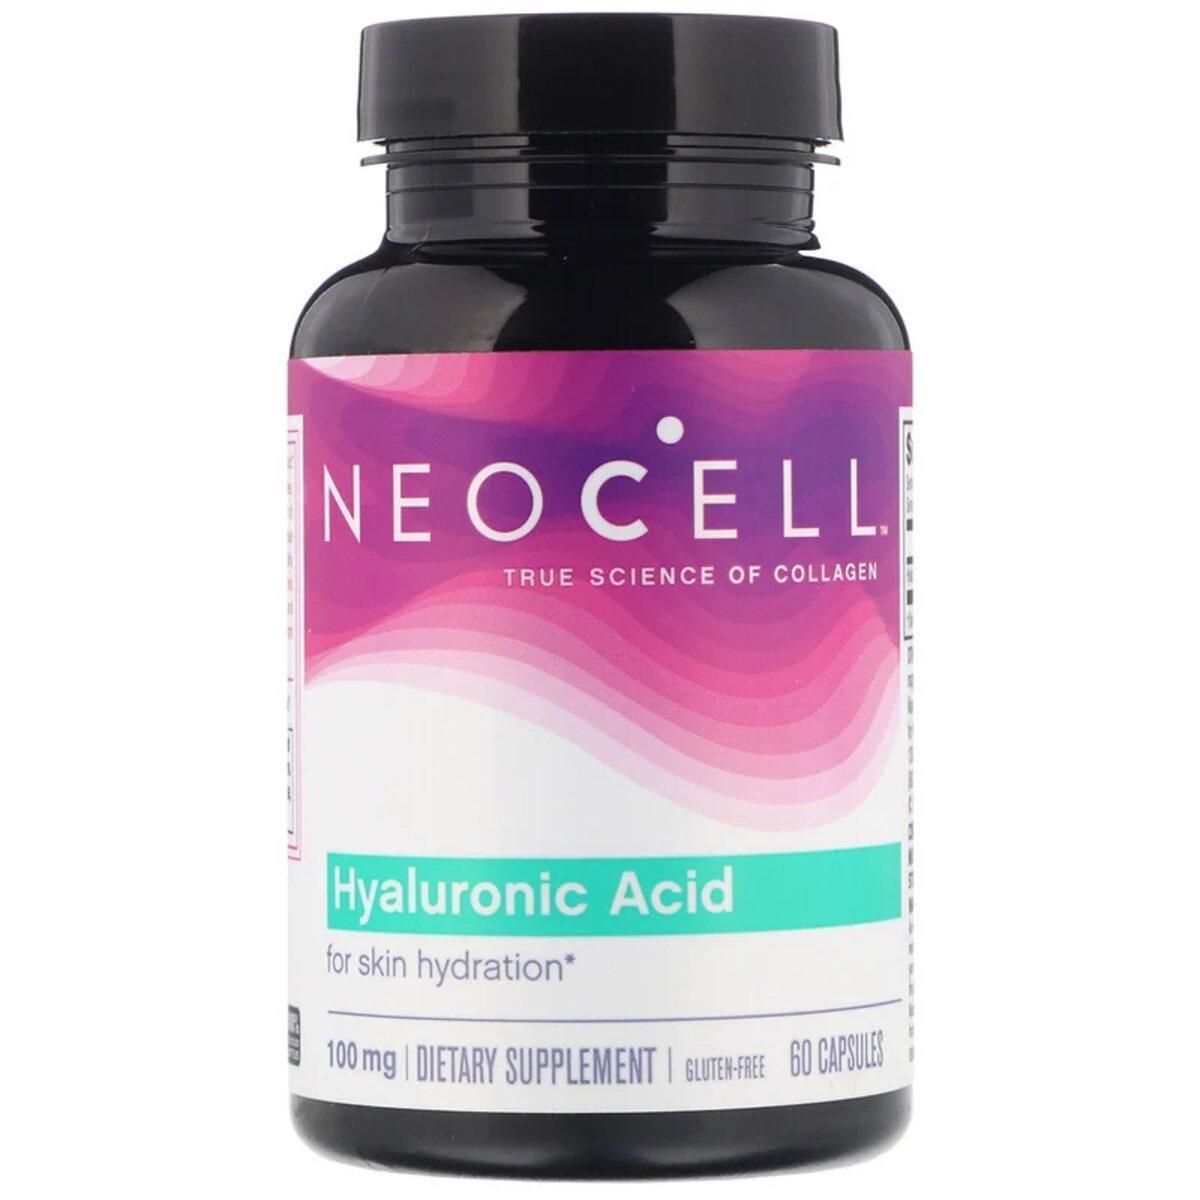 Гиалуроновая кислота, Hyaluronic Acid, 100 мг, Neocell, 60 капсул